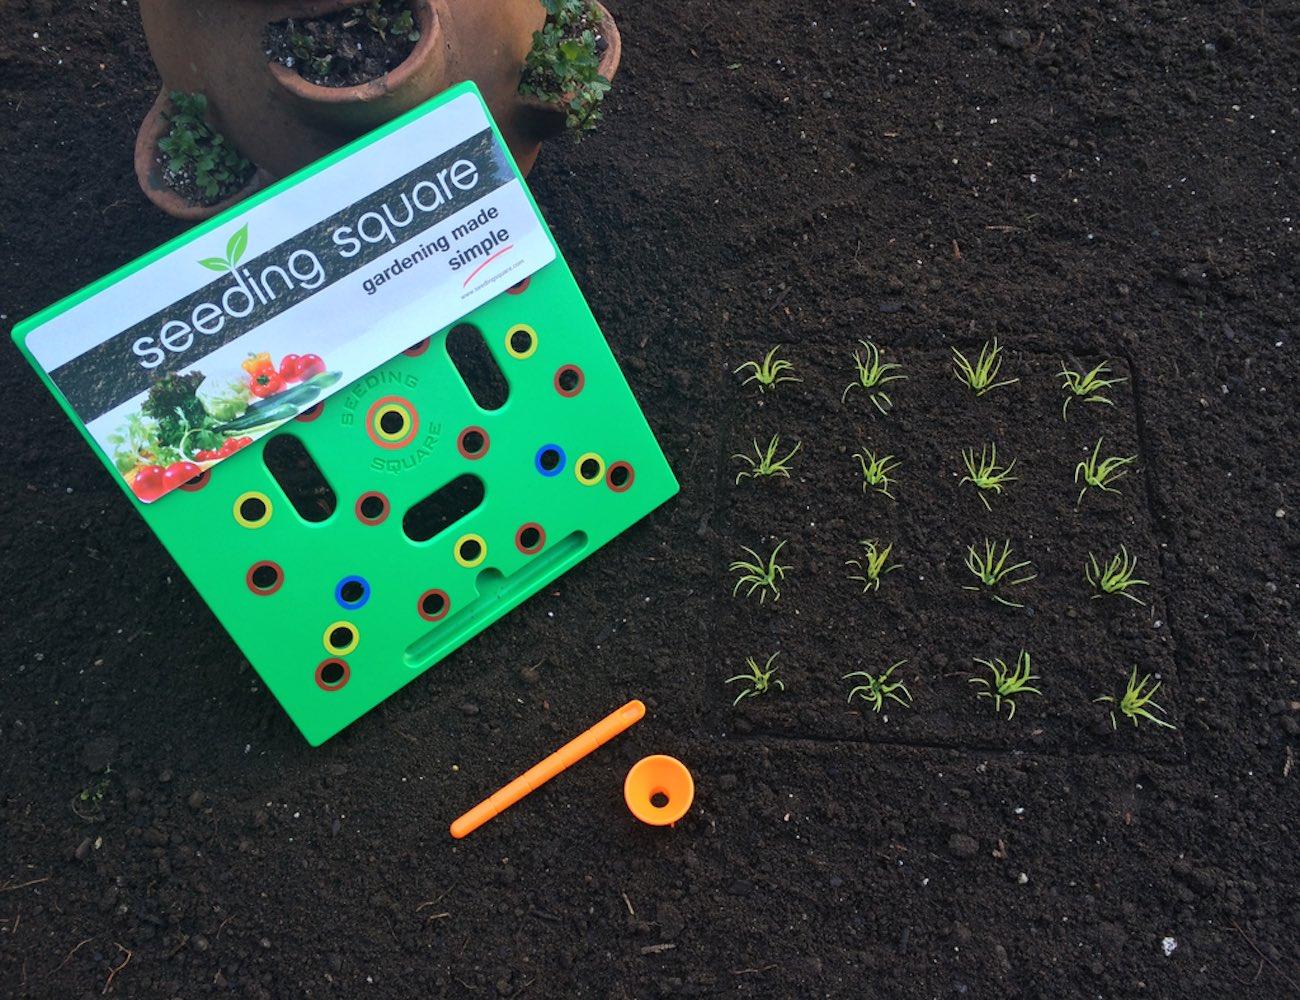 Seeding Square